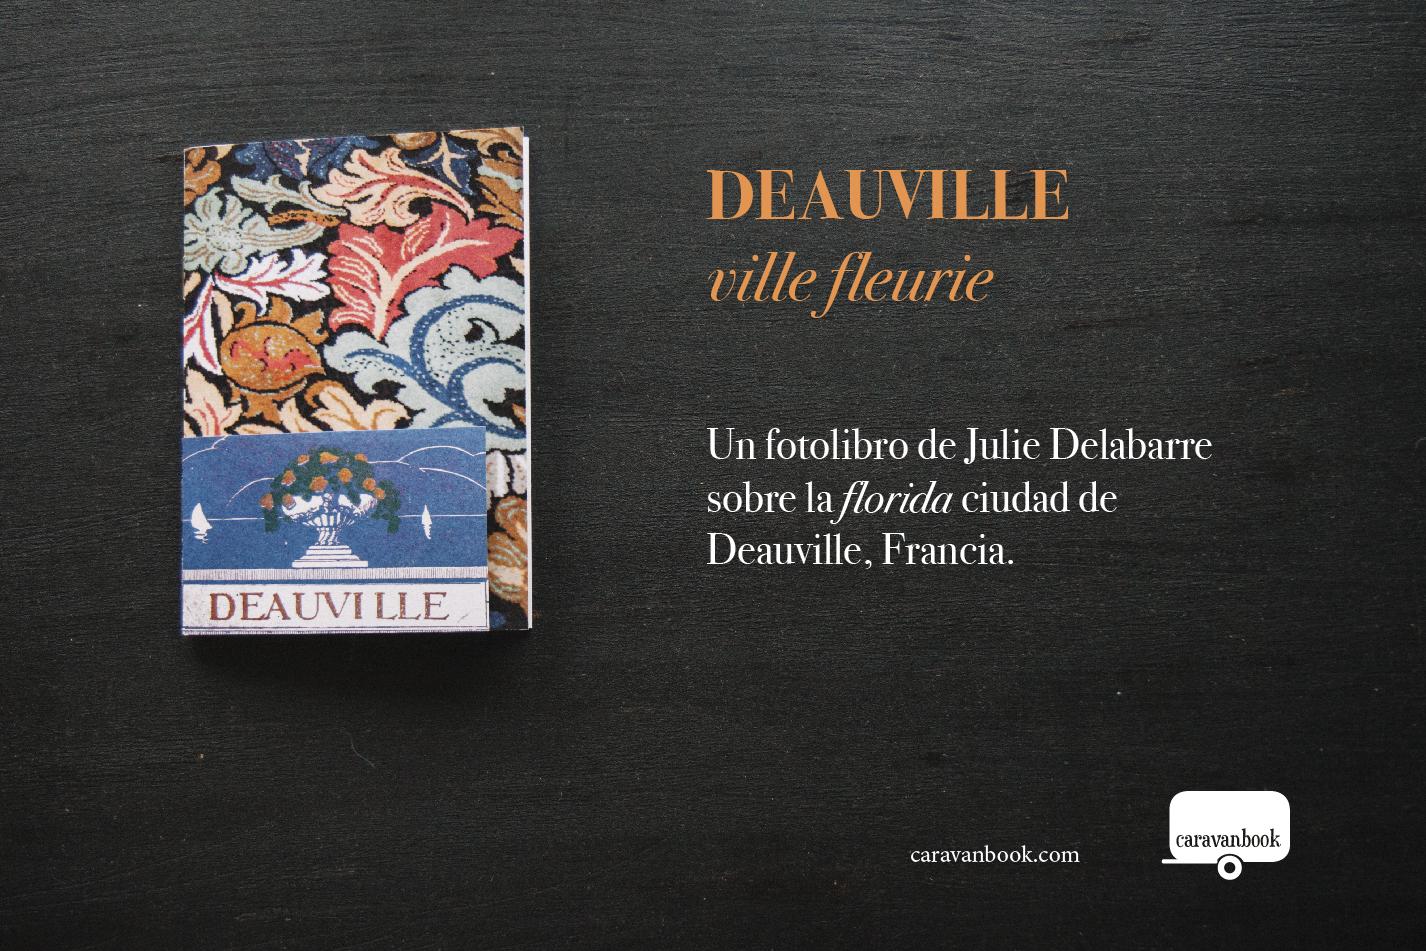 caravanbook_Deauville_photobook_spanish.jpg